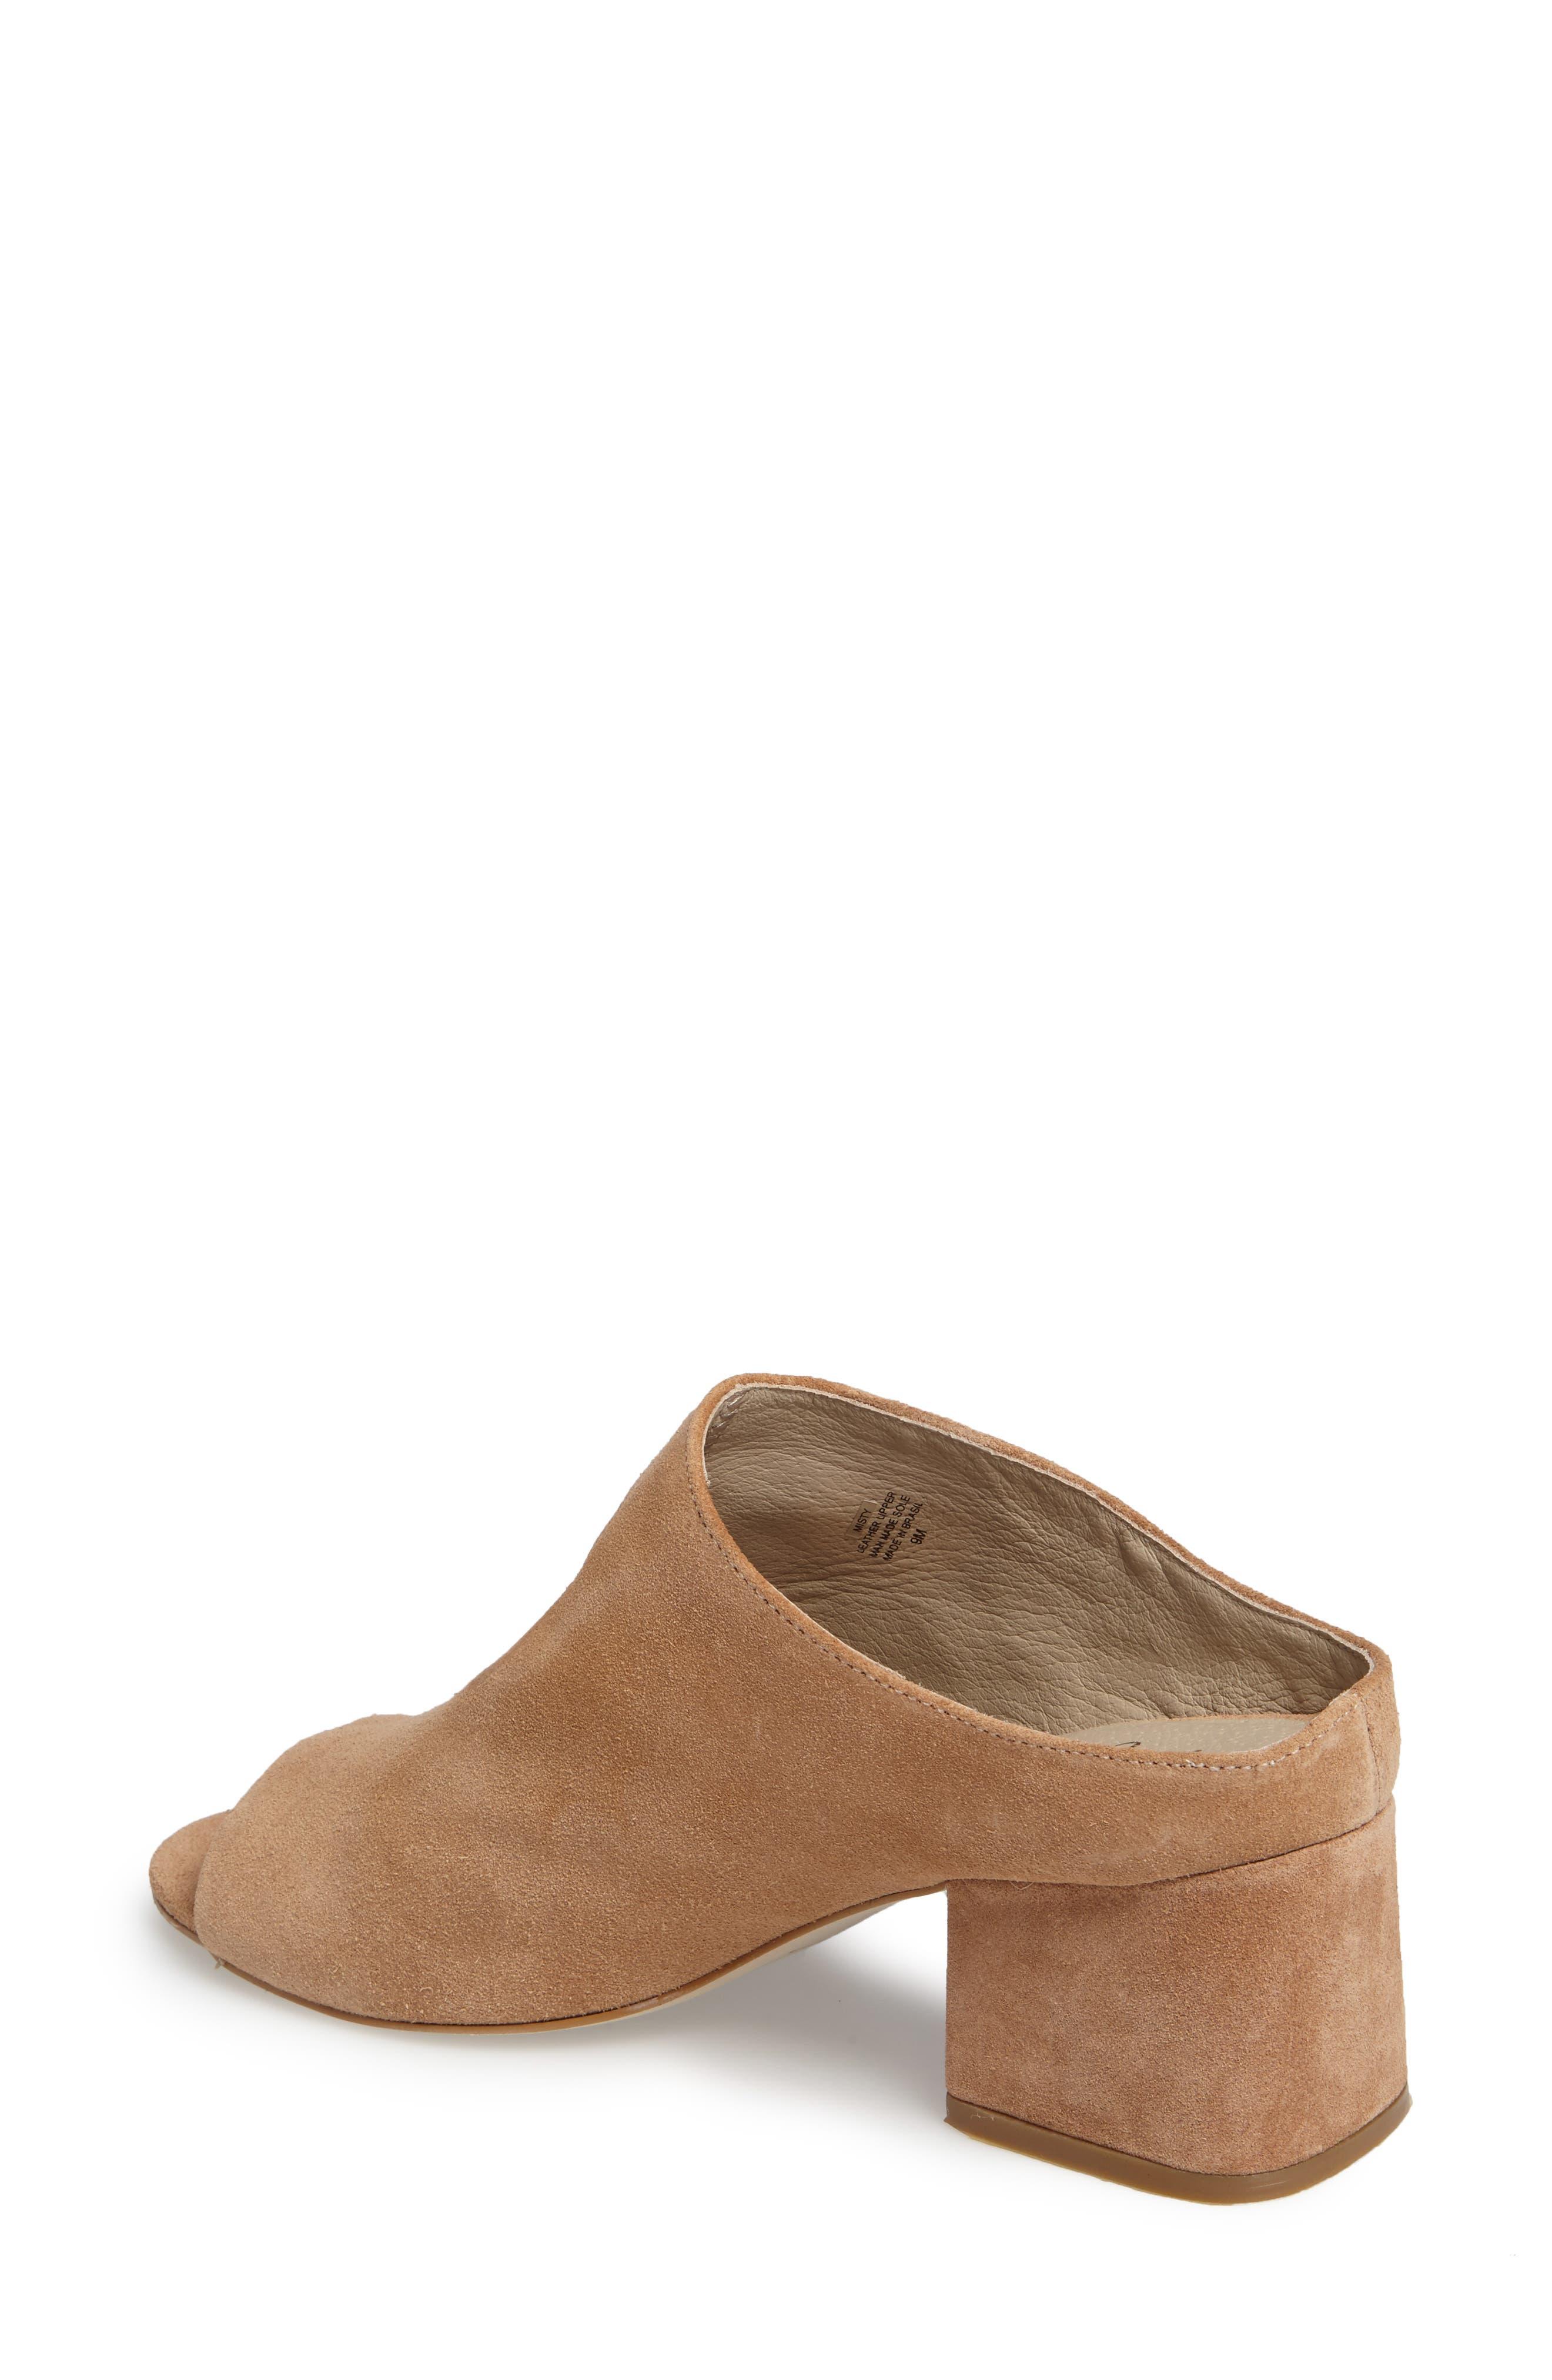 Alternate Image 2  - Matisse Misty Block Heel Mule (Women)